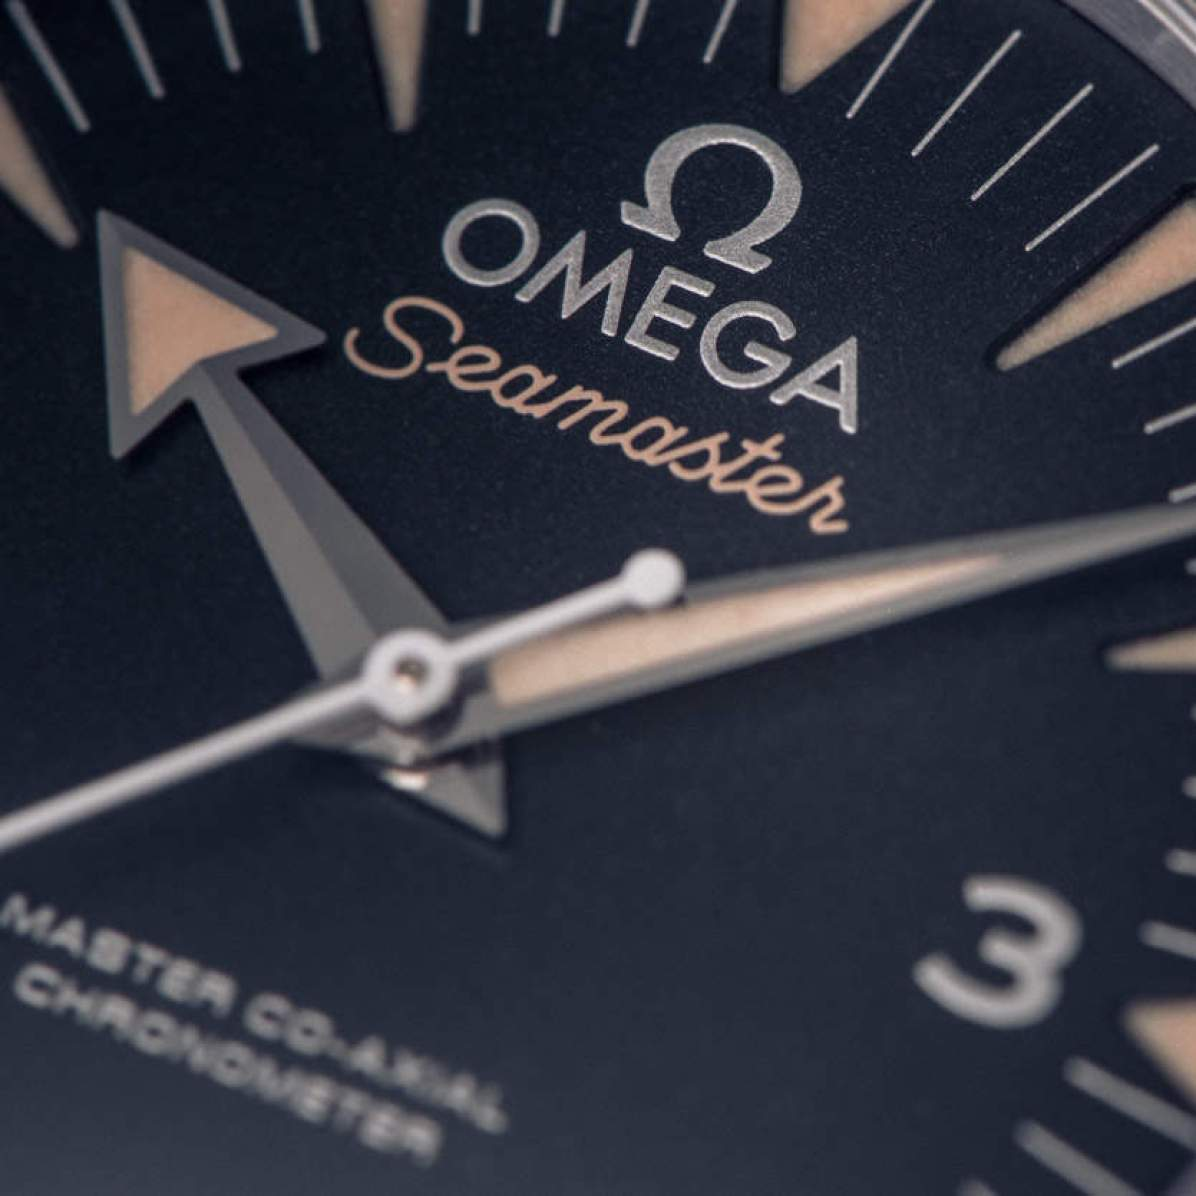 Omega Seamaster 300 Spectre dial